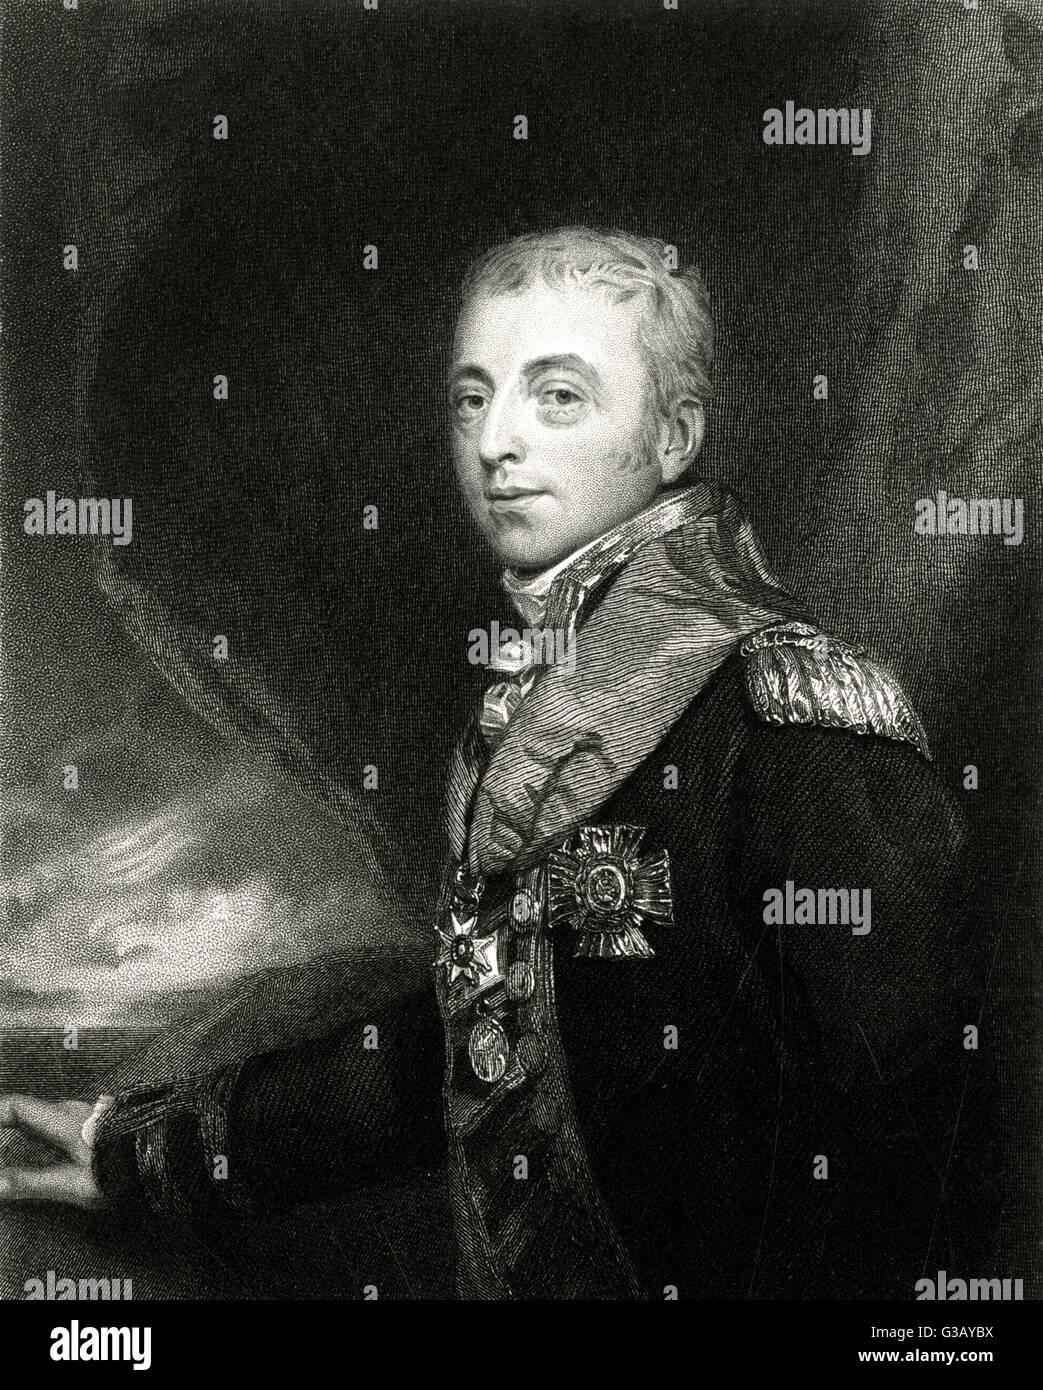 ALAN, BARON GARDNER  naval commander        Date: 1742 - 1809 - Stock Image